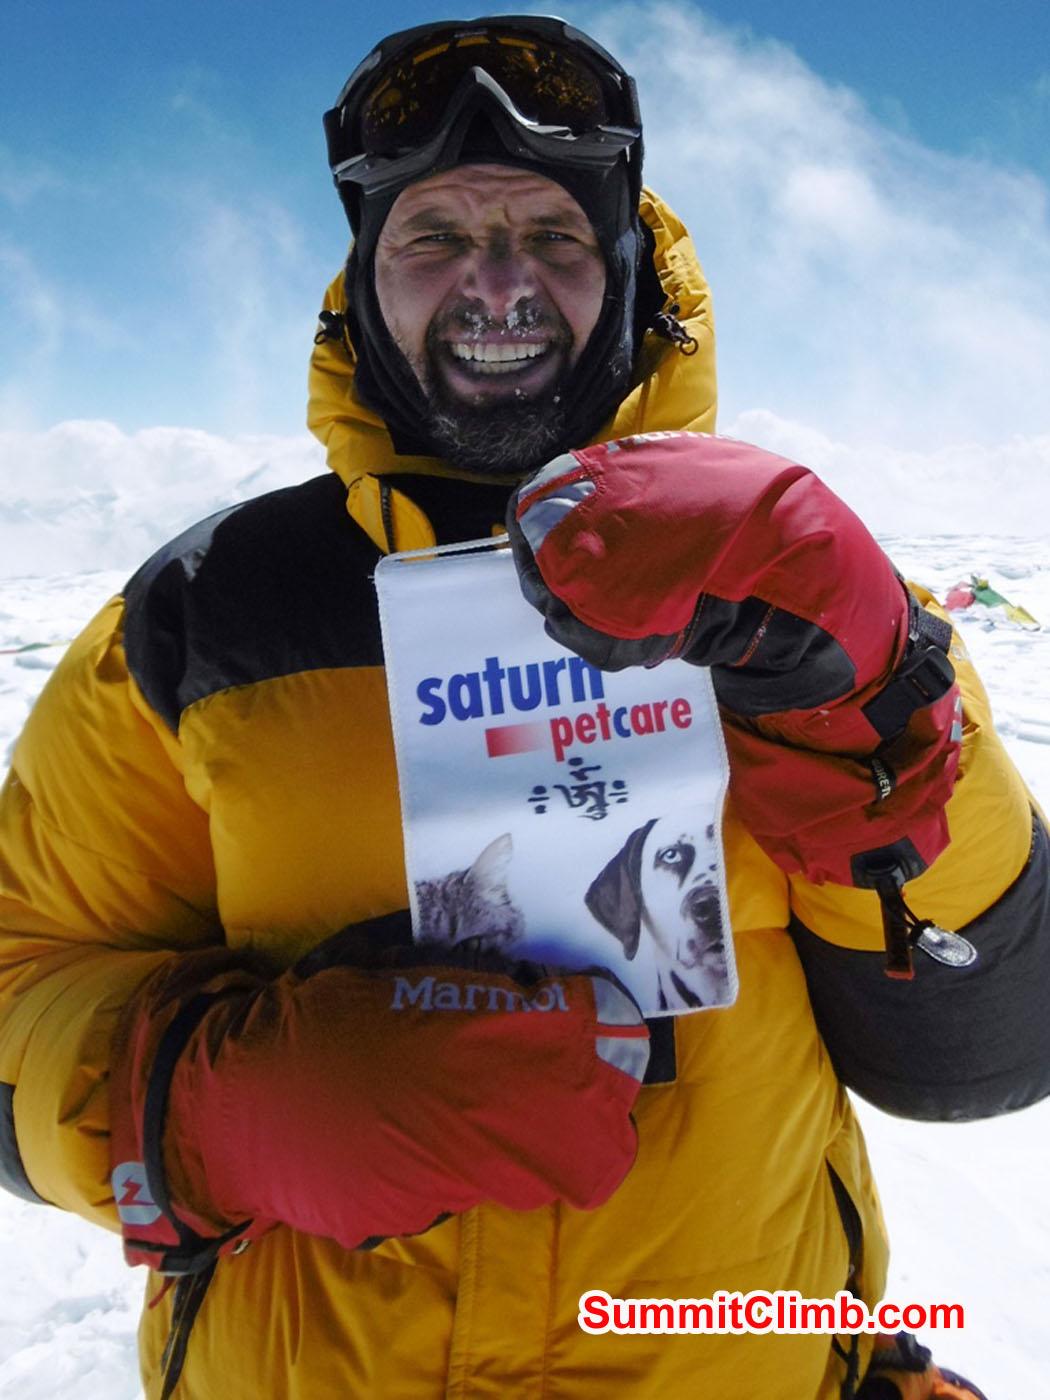 Christian on the summit. Stefan Simchen Photo